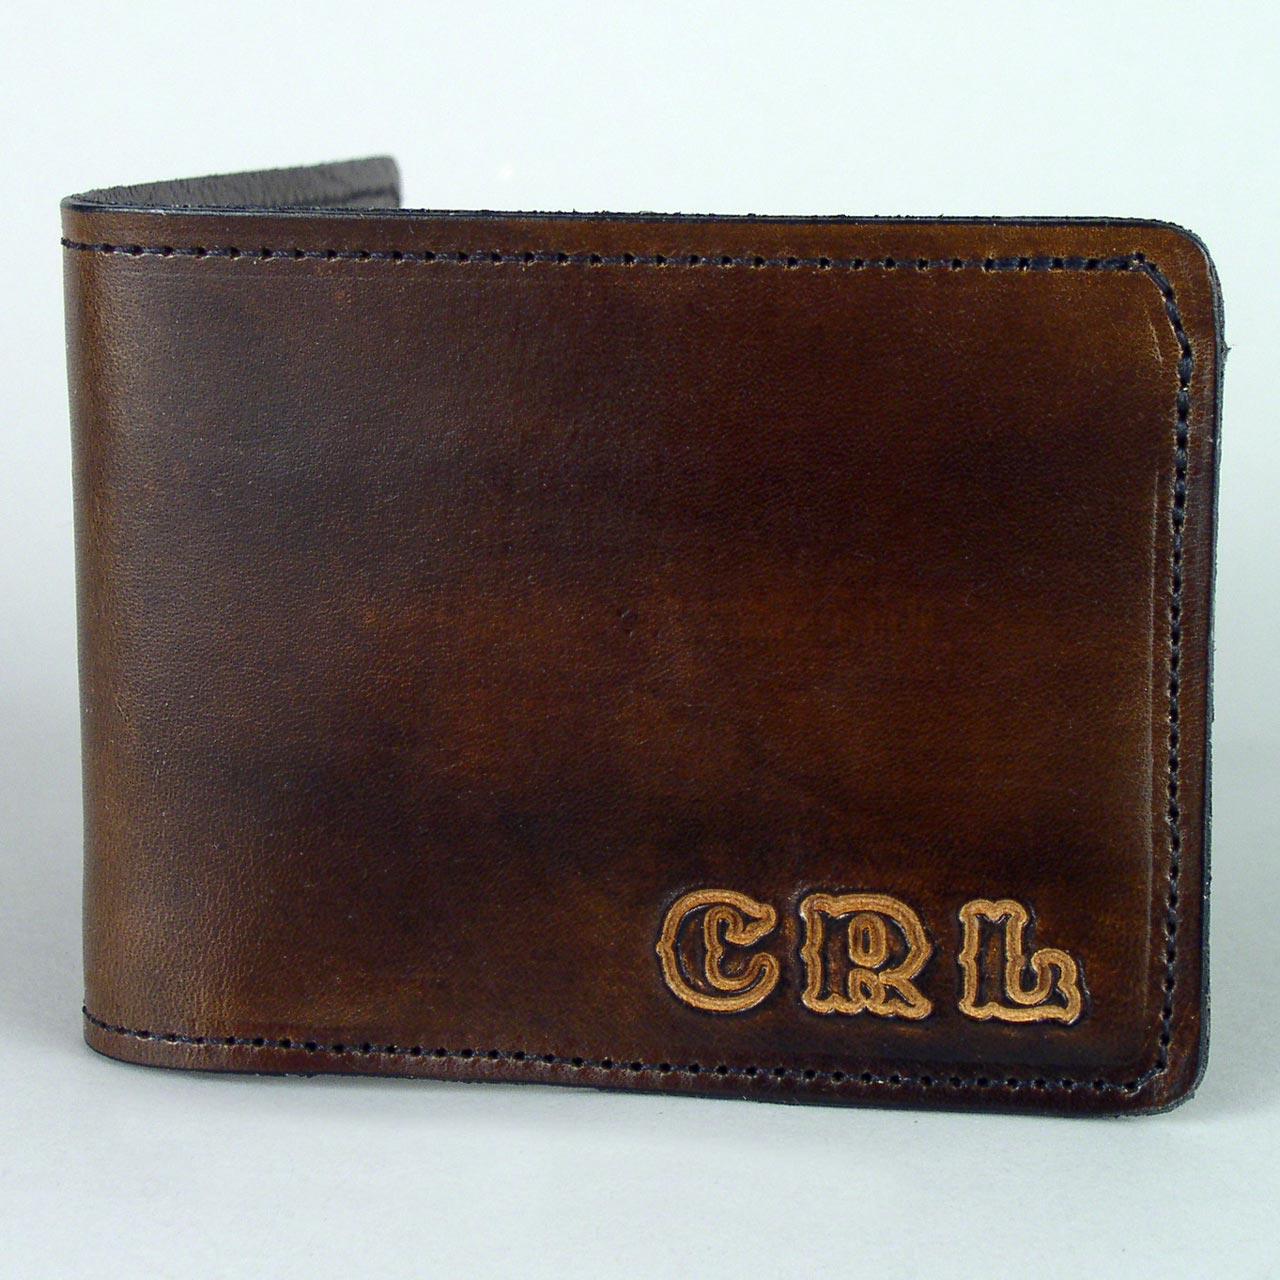 wallet-birthday-gift.jpg